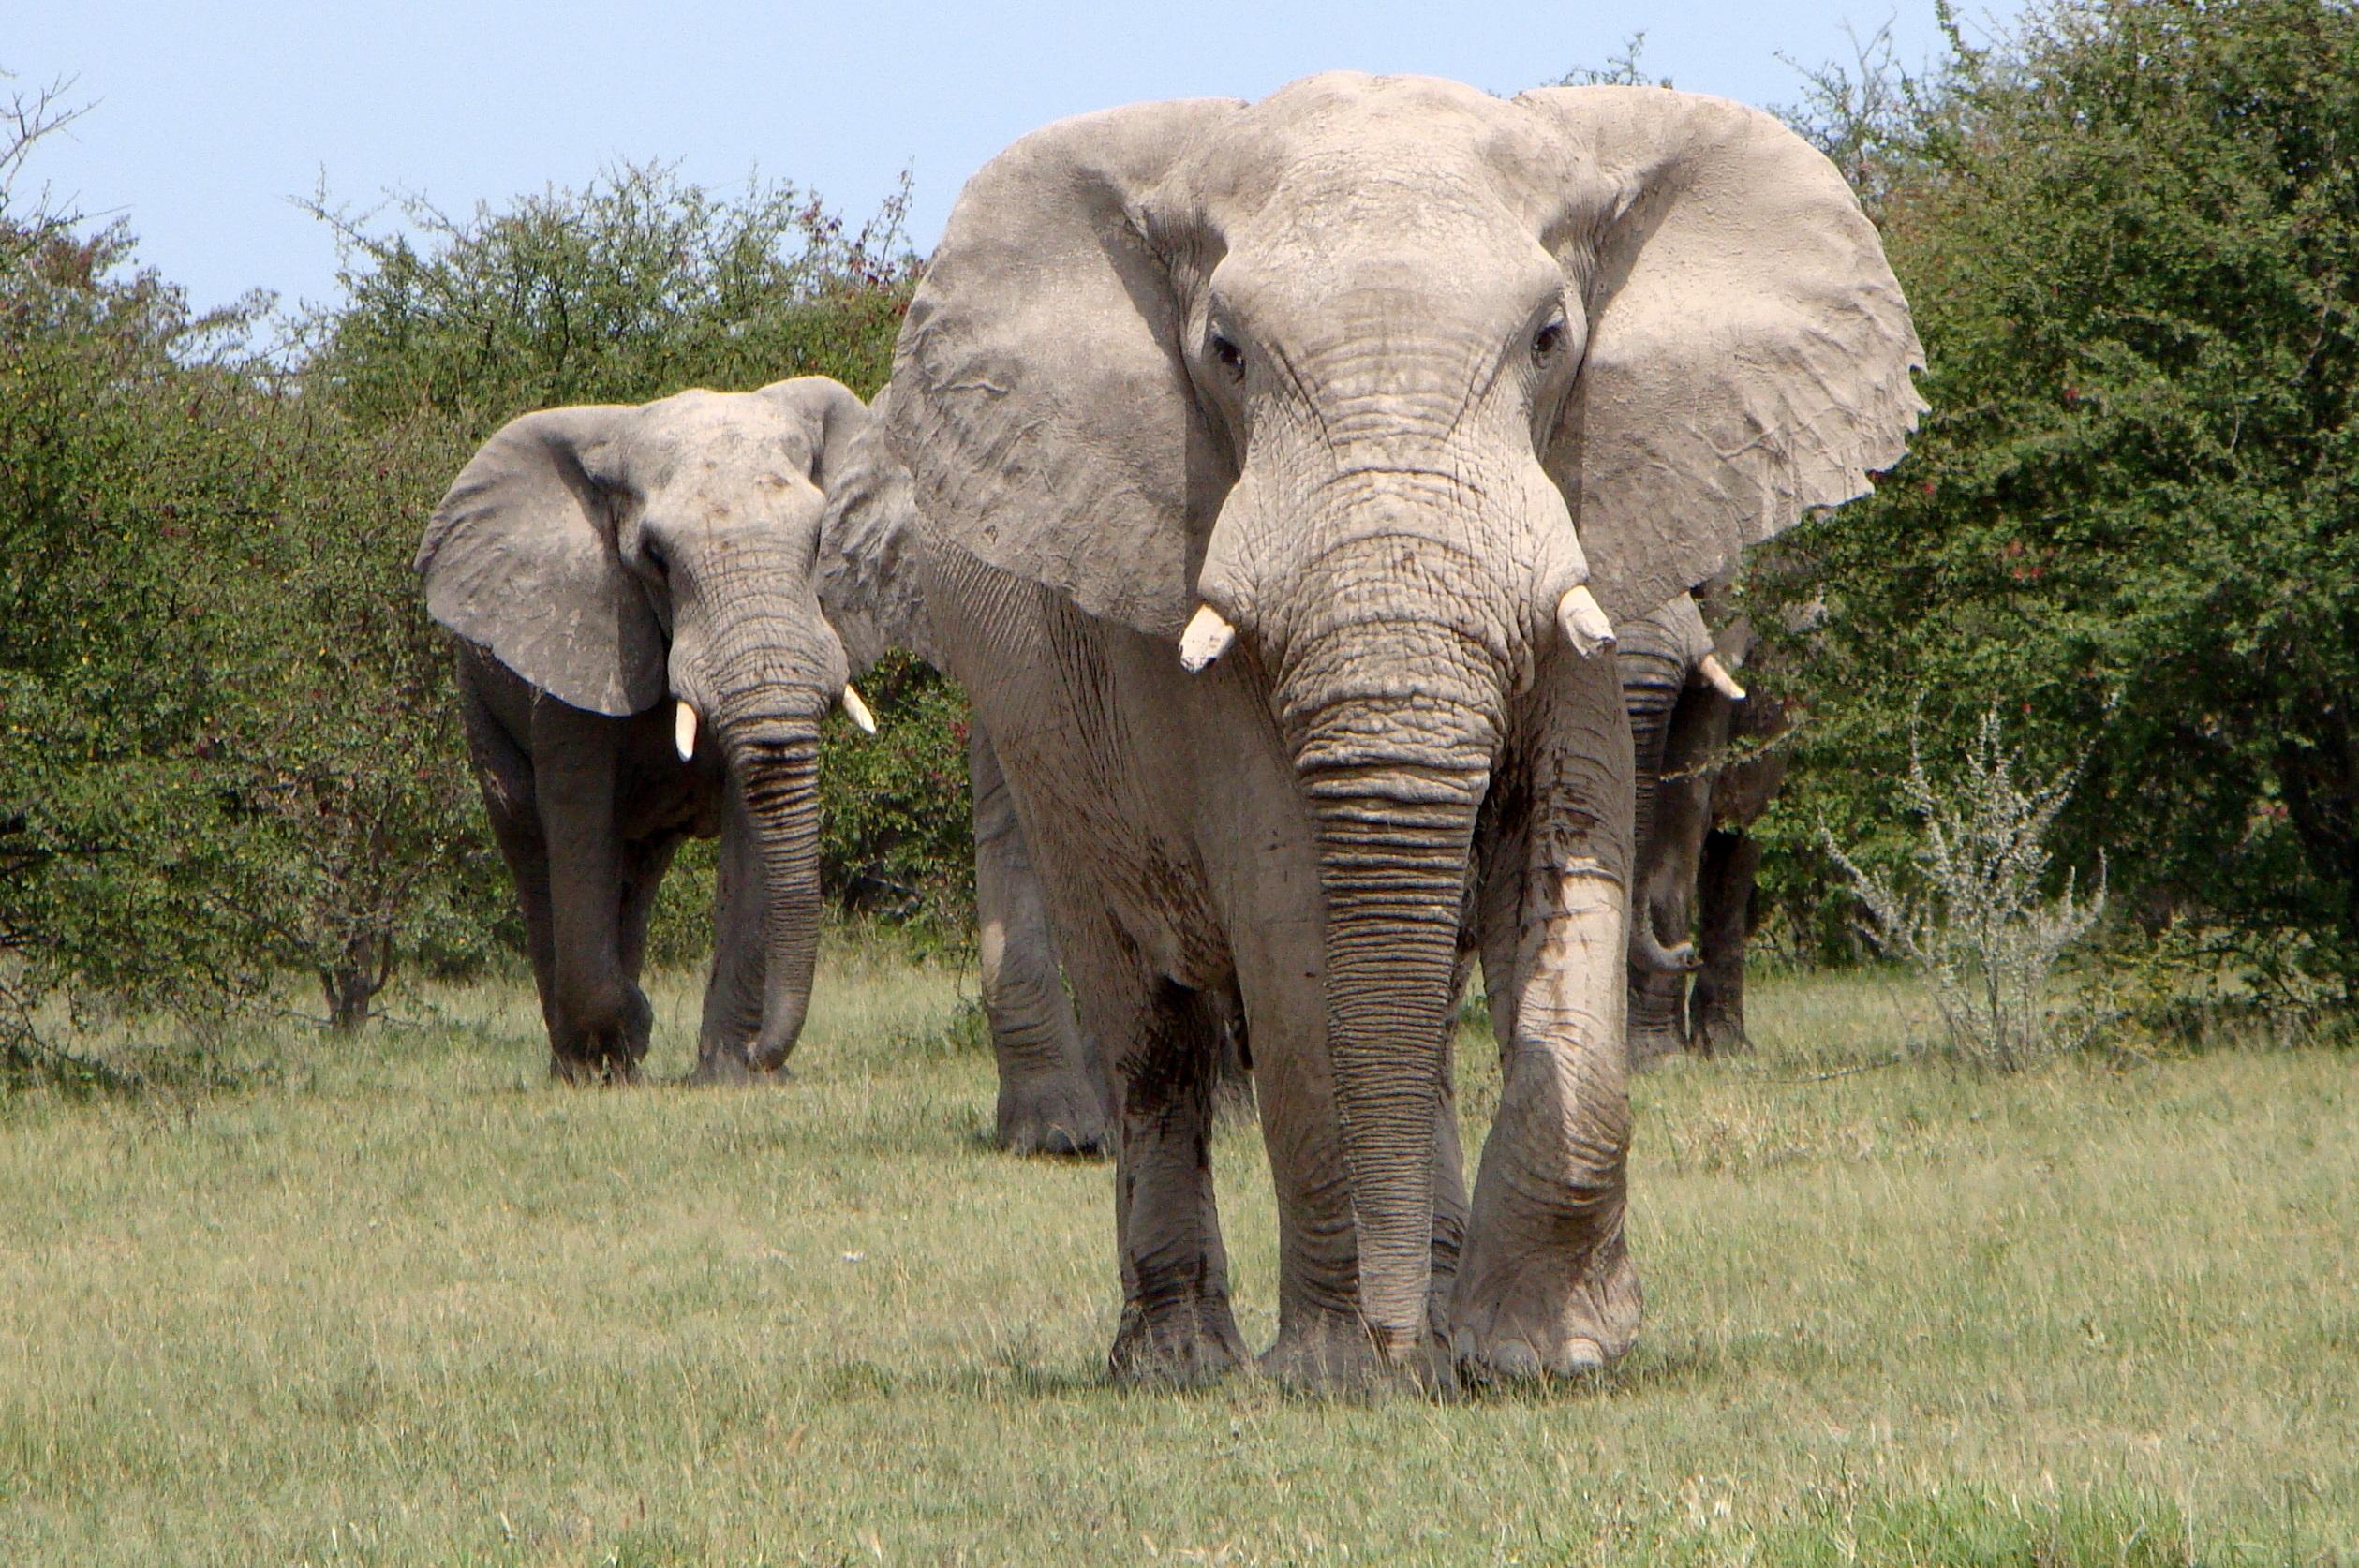 F.Paschoal.Desert. Elephants in Nxai Pan. Guide - George. tour oparator - Safari Destinations(Kar